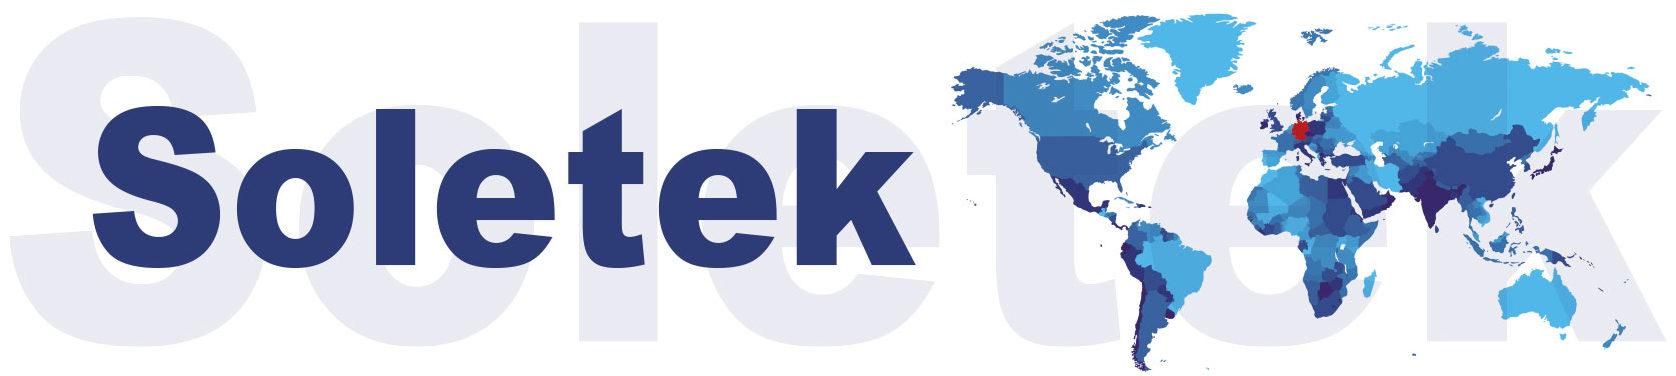 soletek.com